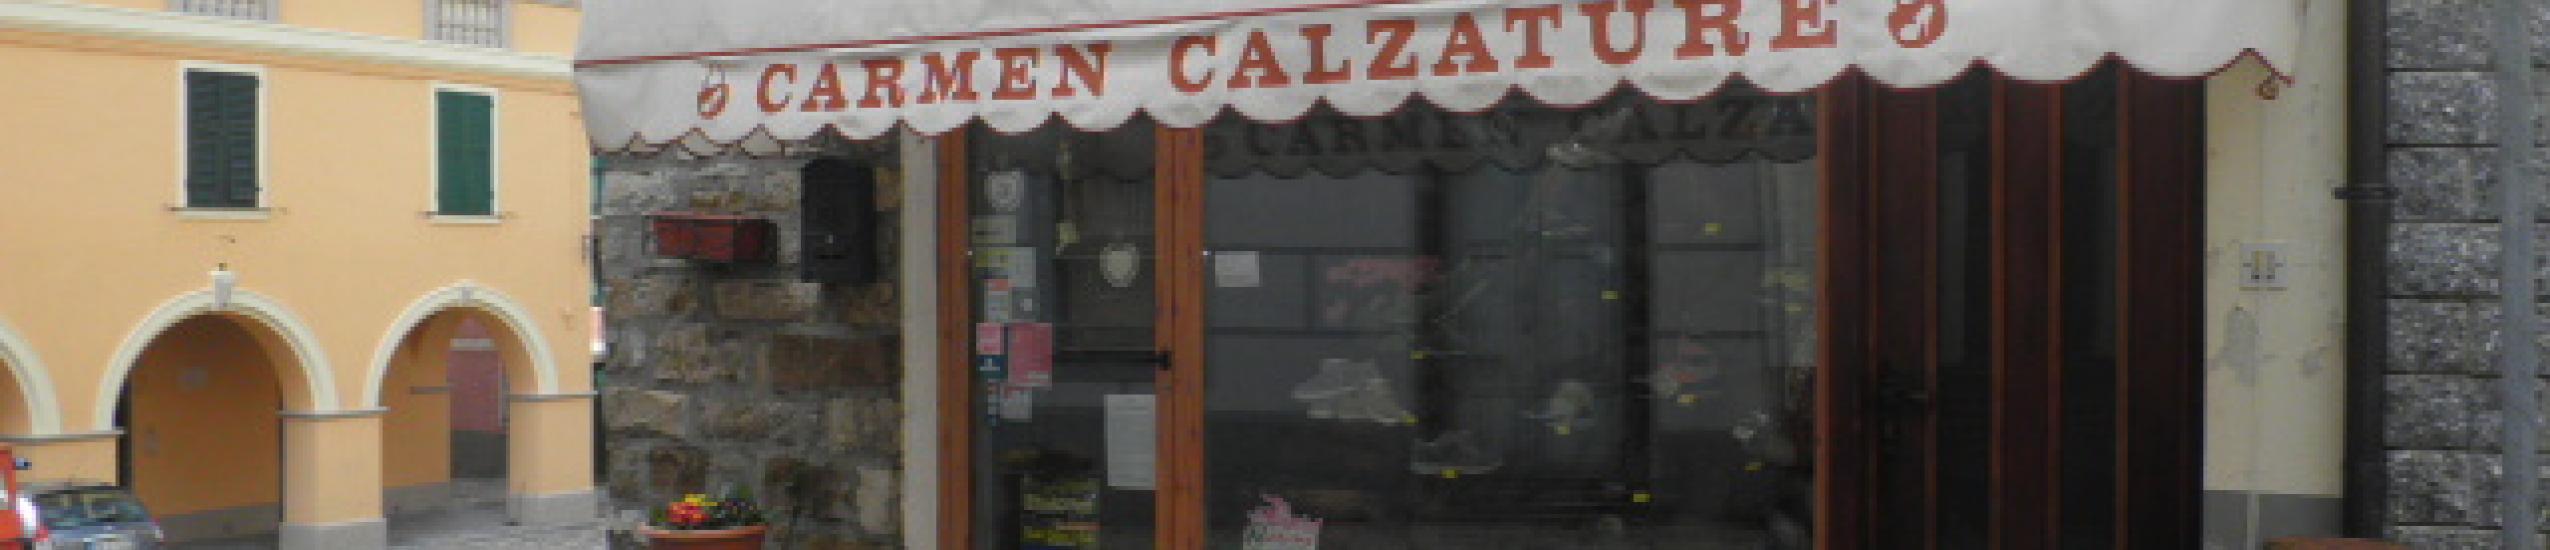 Carmen calzature